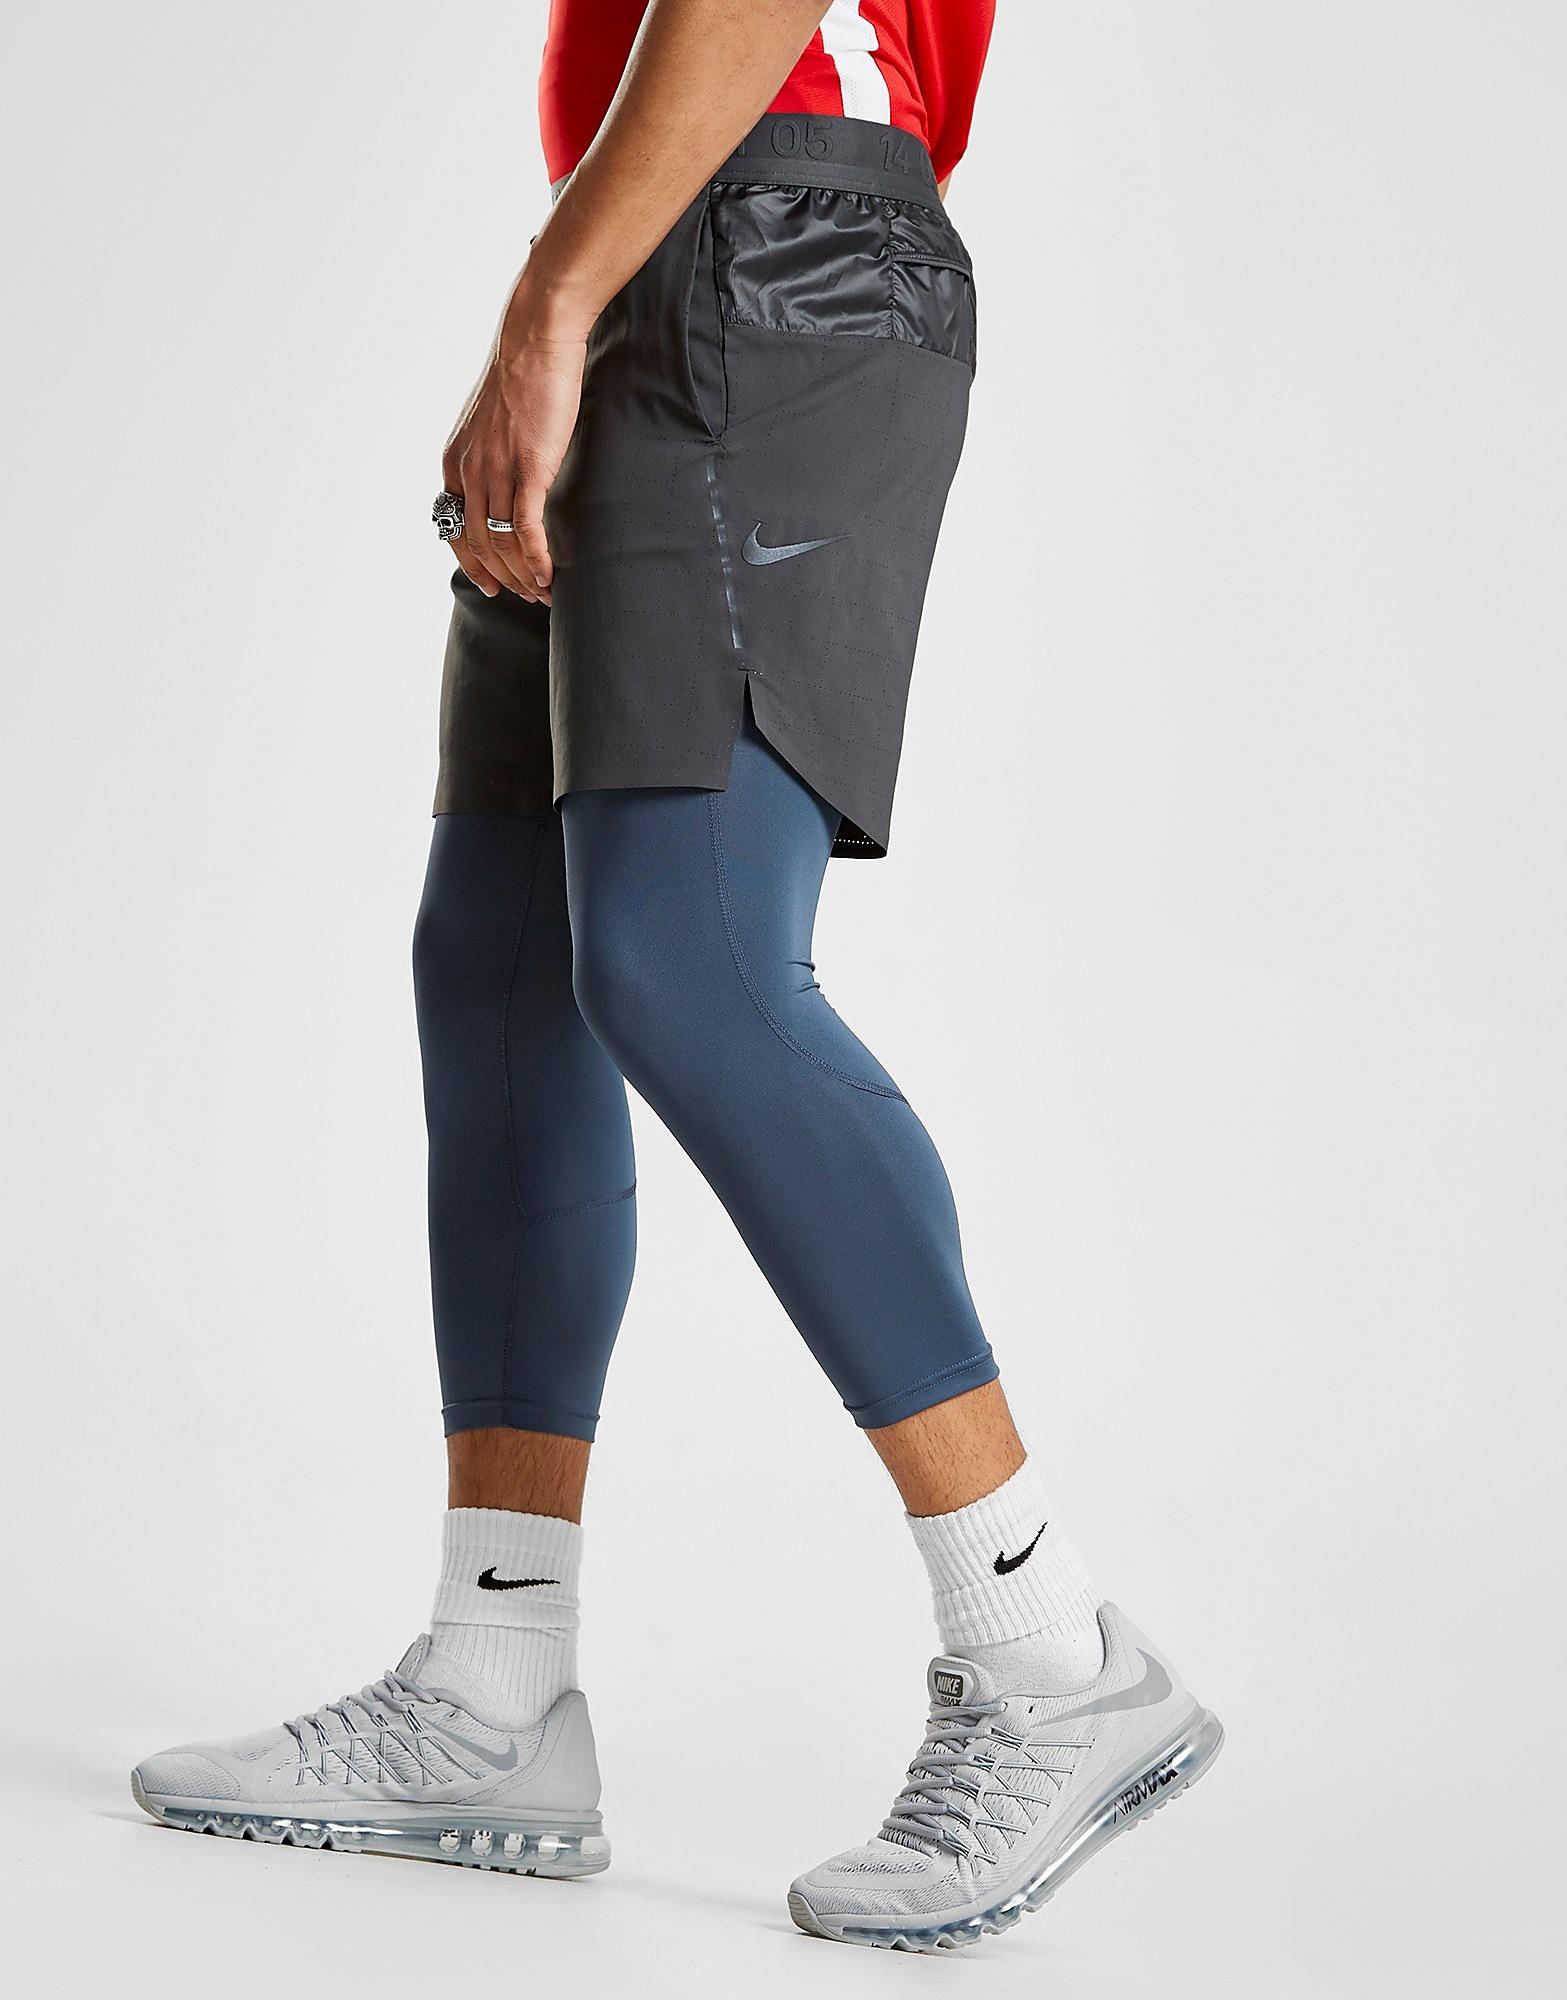 Nike Tech Grid 2in1 Shorts Heren - Zwart - Heren